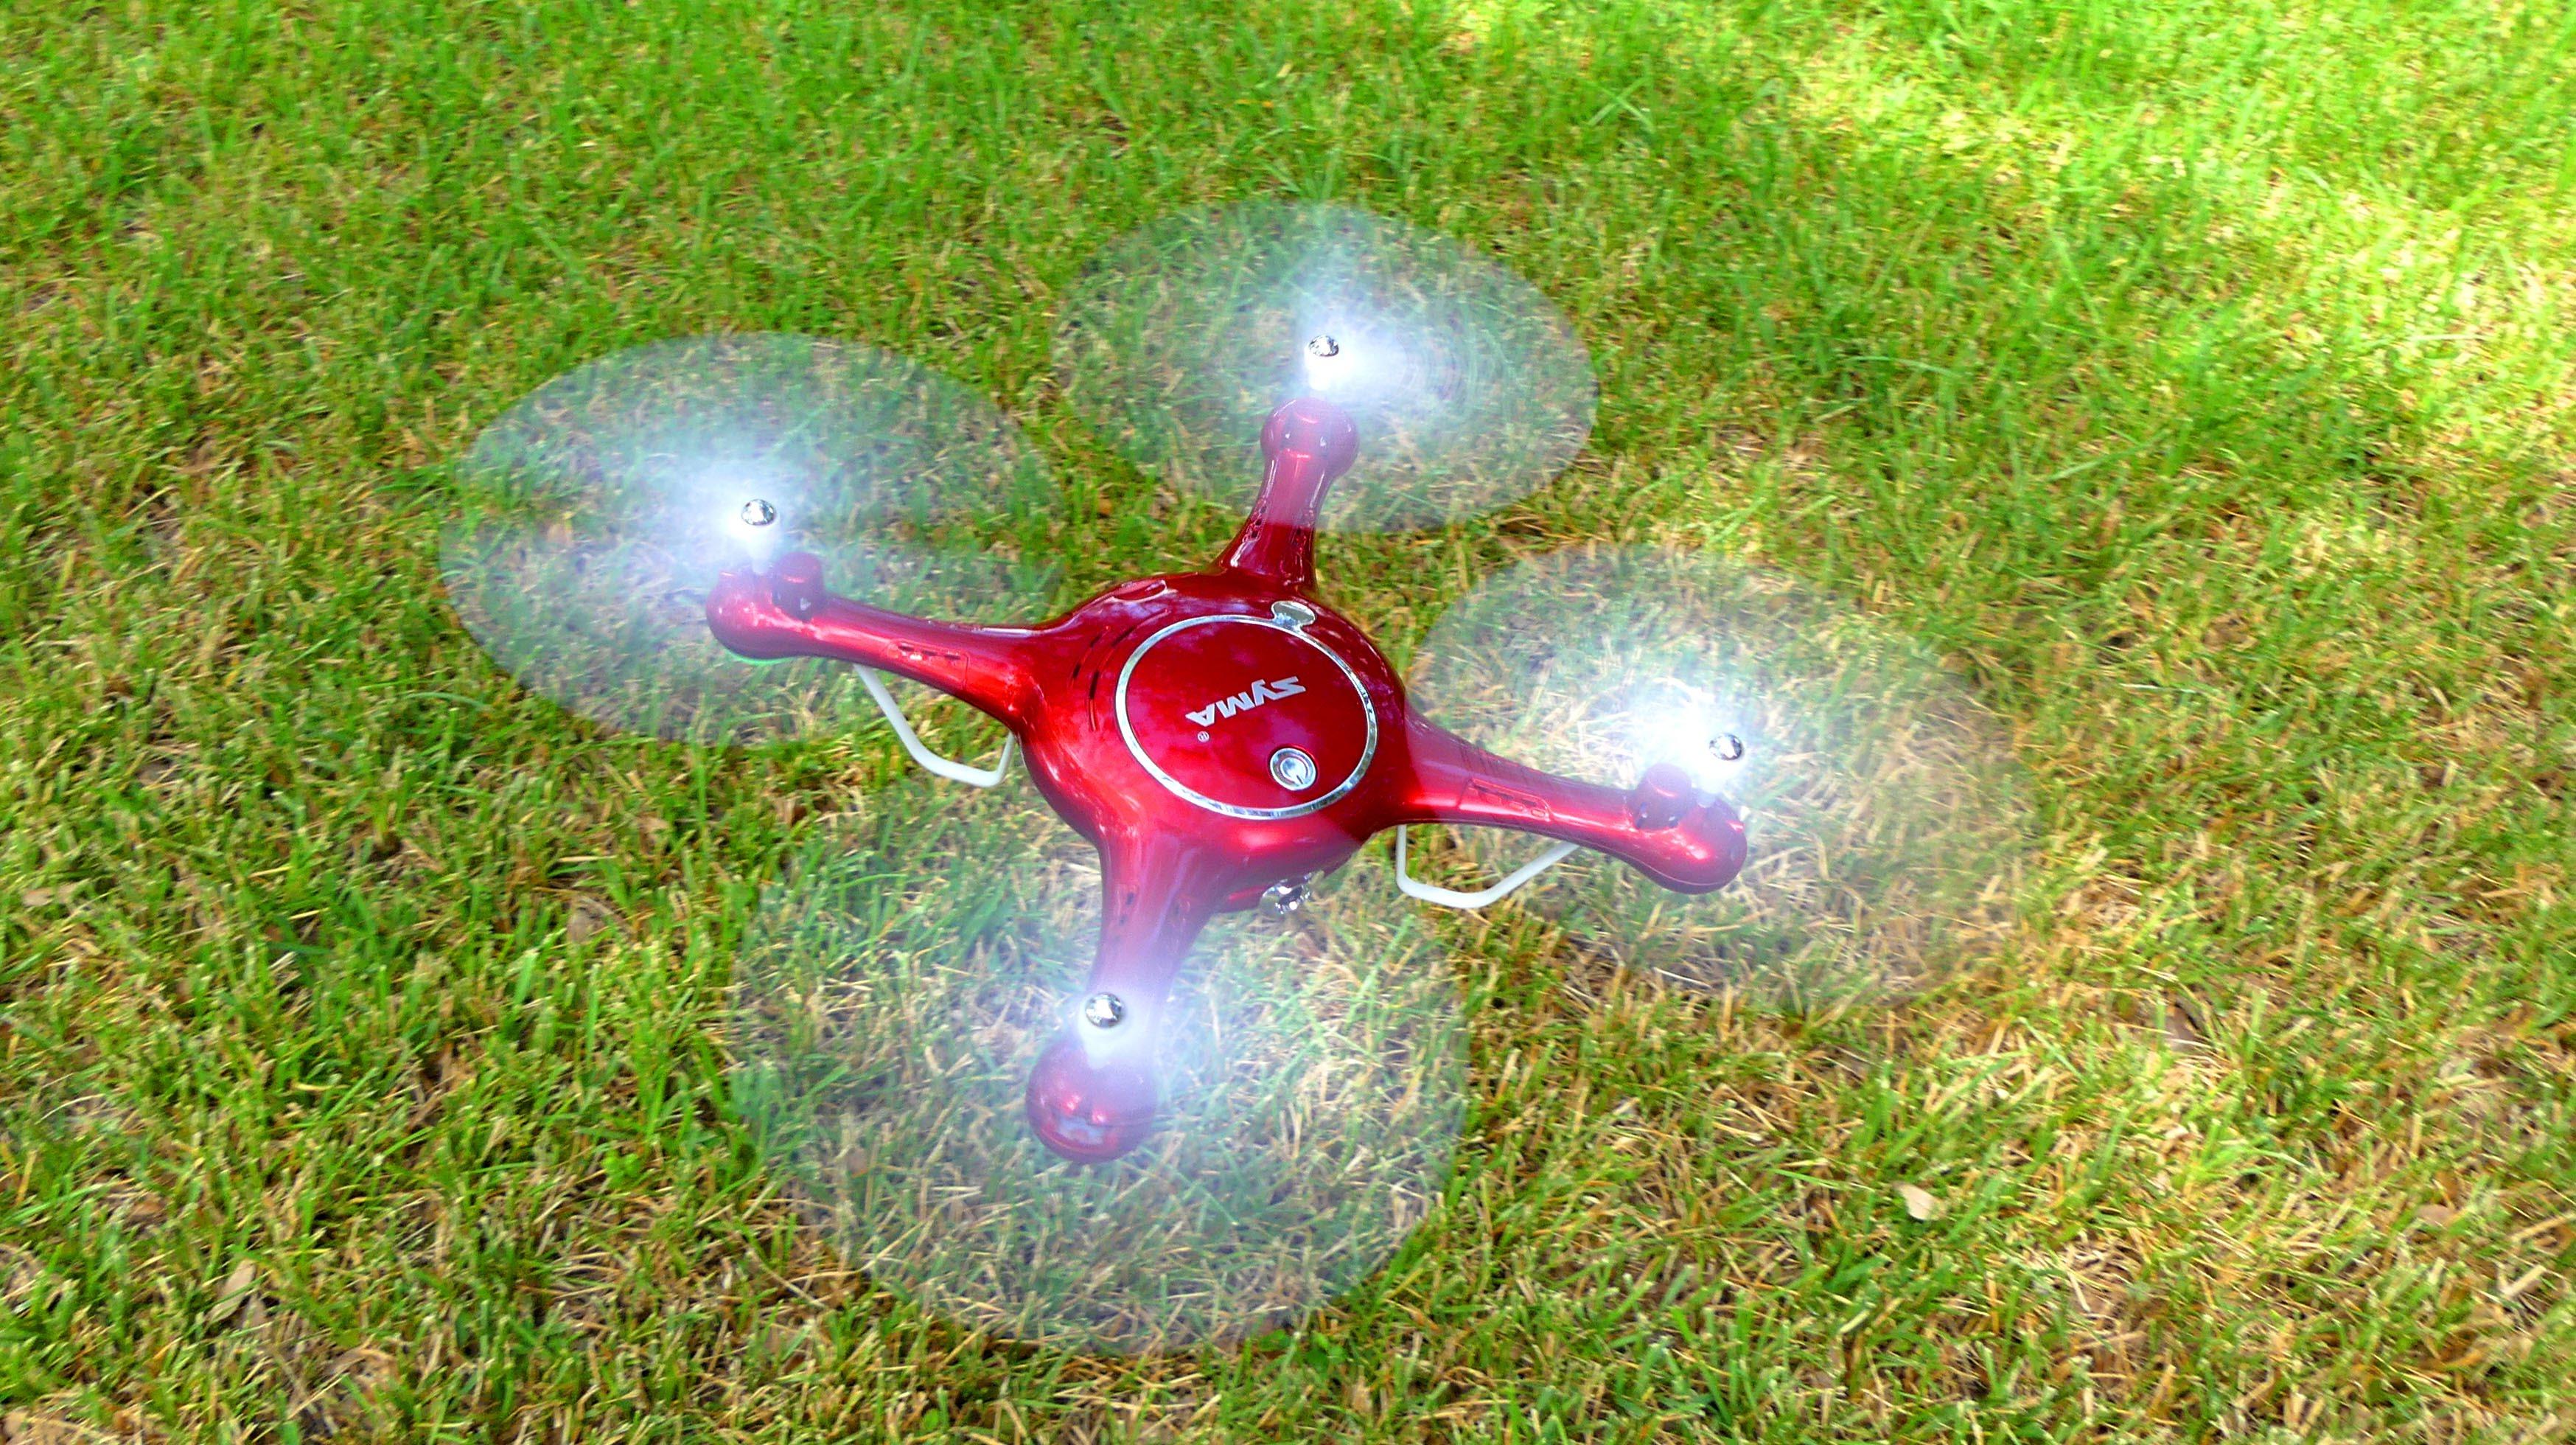 Máy Bay 4 Cánh UFO Điều Khiển Syma X5UW Camera Wifi 6 axis Gyro